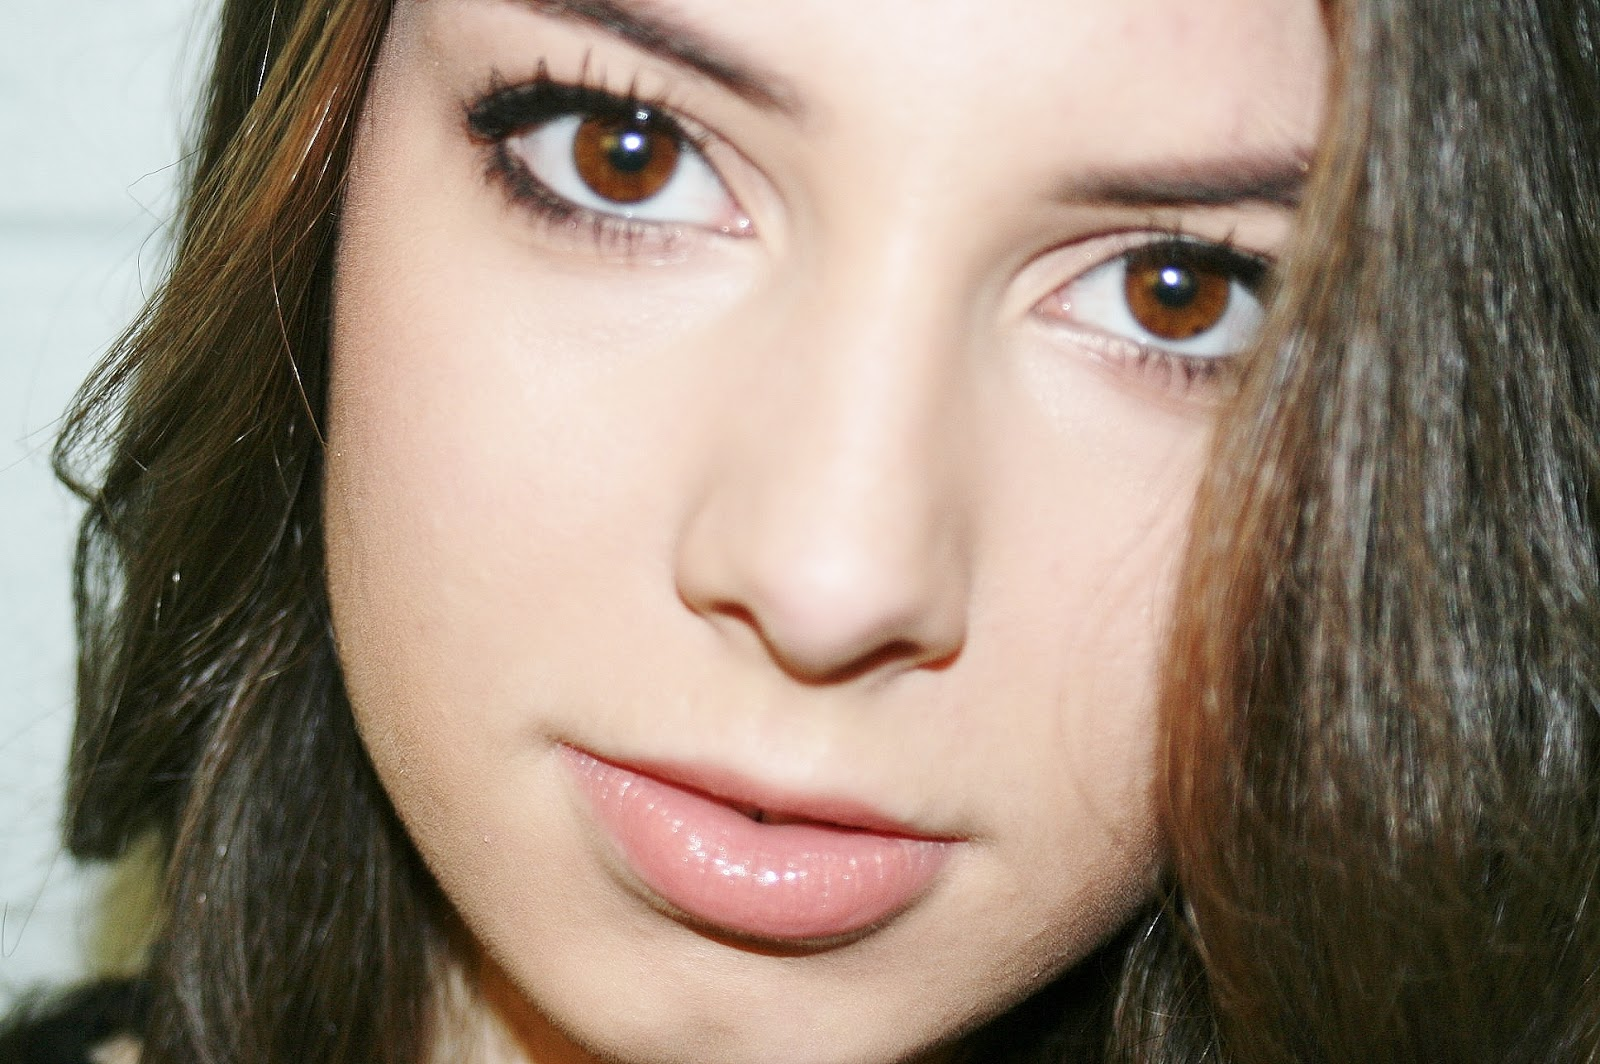 Katherine Penney Chic Makeup Look Beauty Curled Hair Smokey Eyeshadow